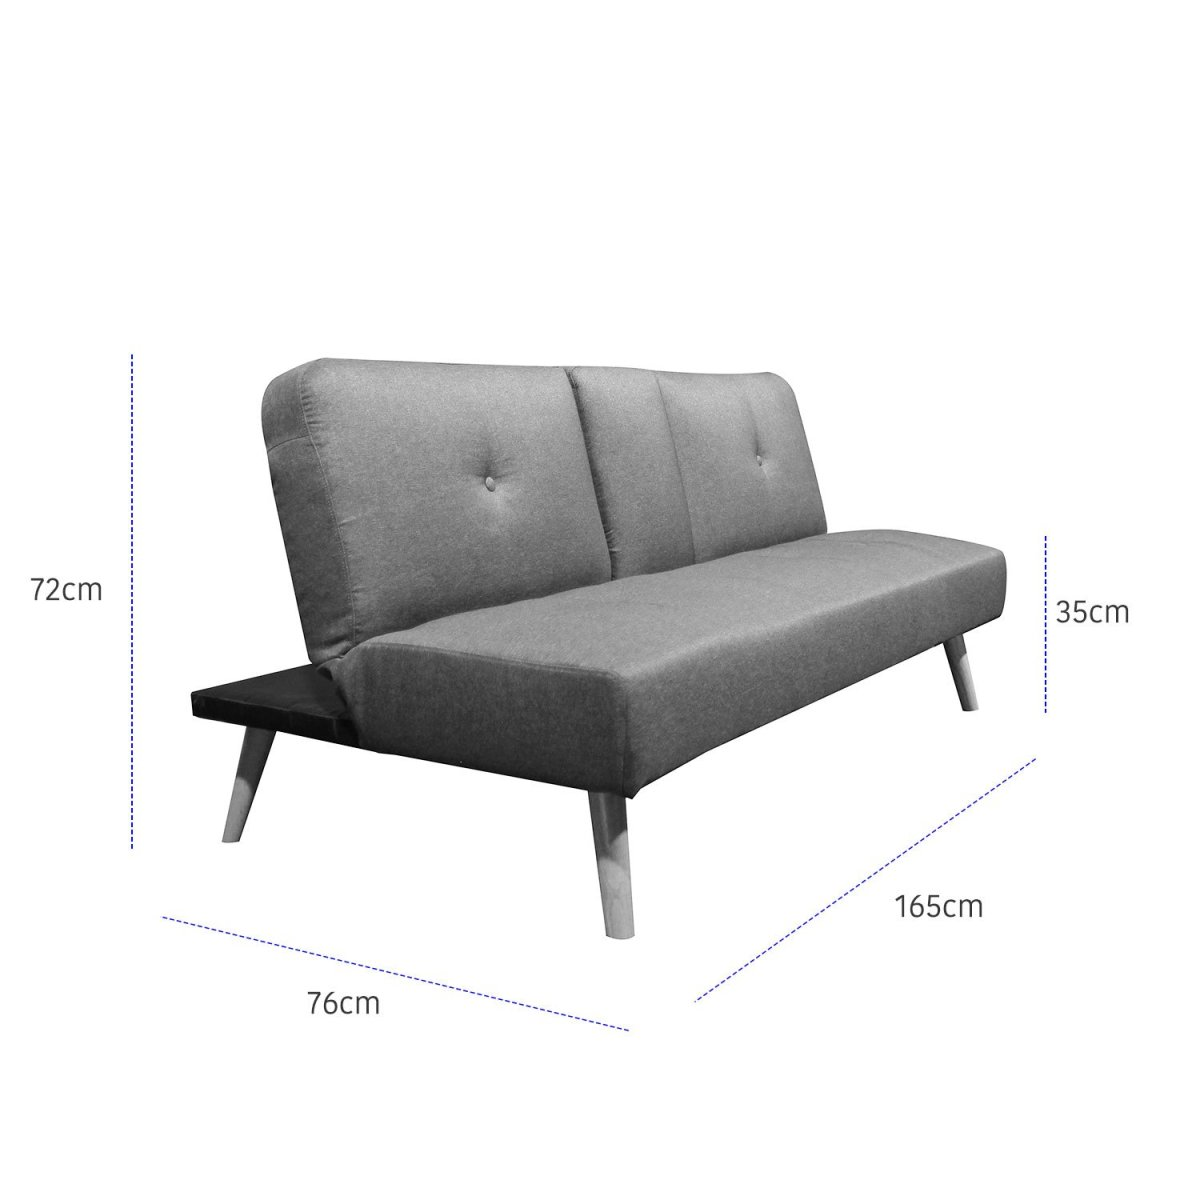 sofá cama hobbs 165 con portavasos 8